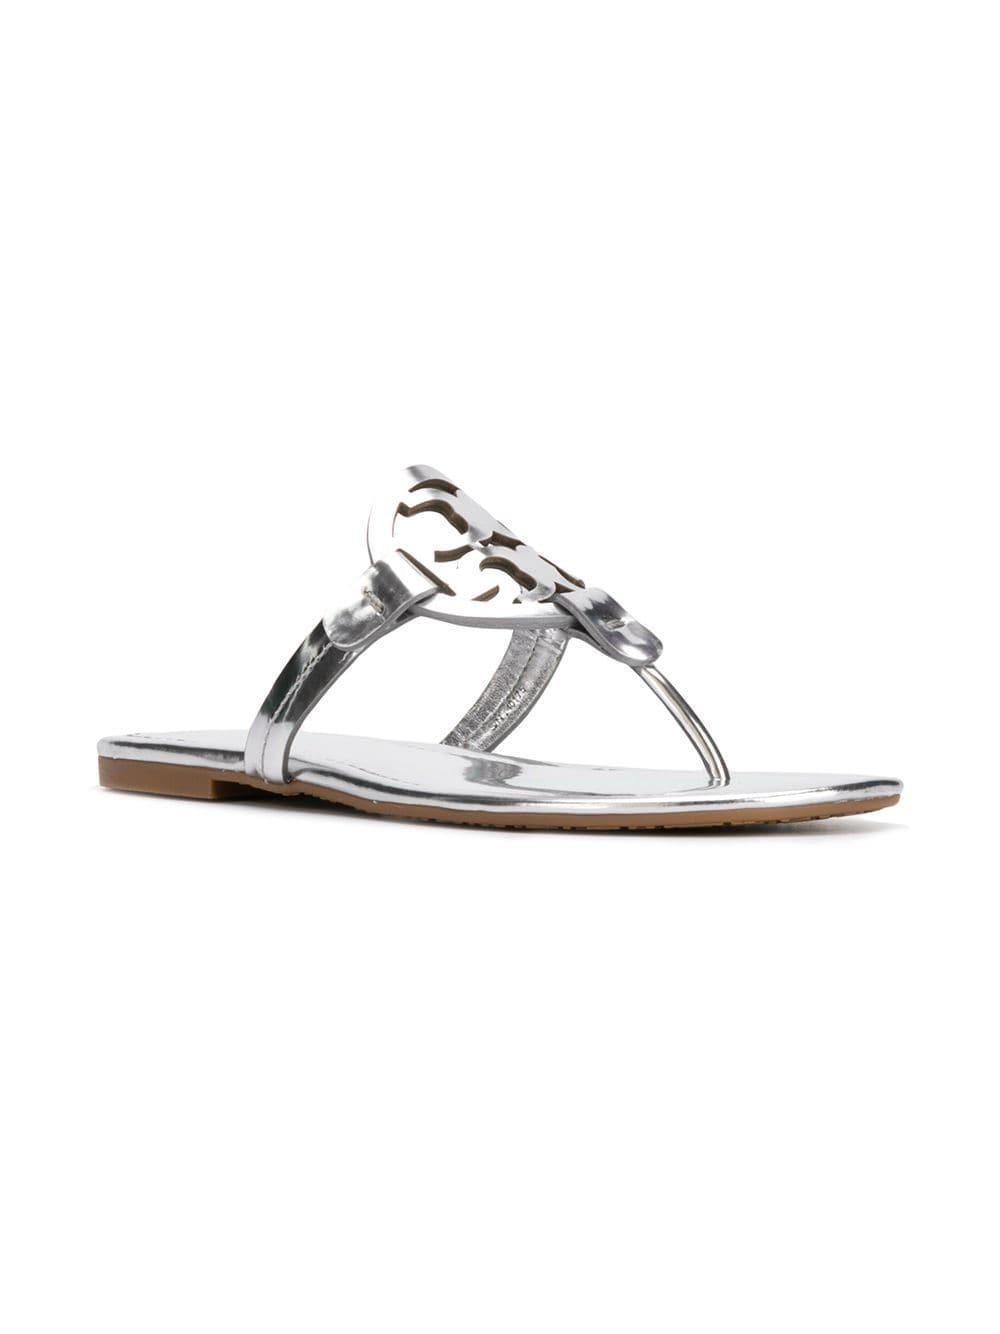 ca52206ec6a Tory Burch - Metallic Miller Leather Sandals - Lyst. View fullscreen